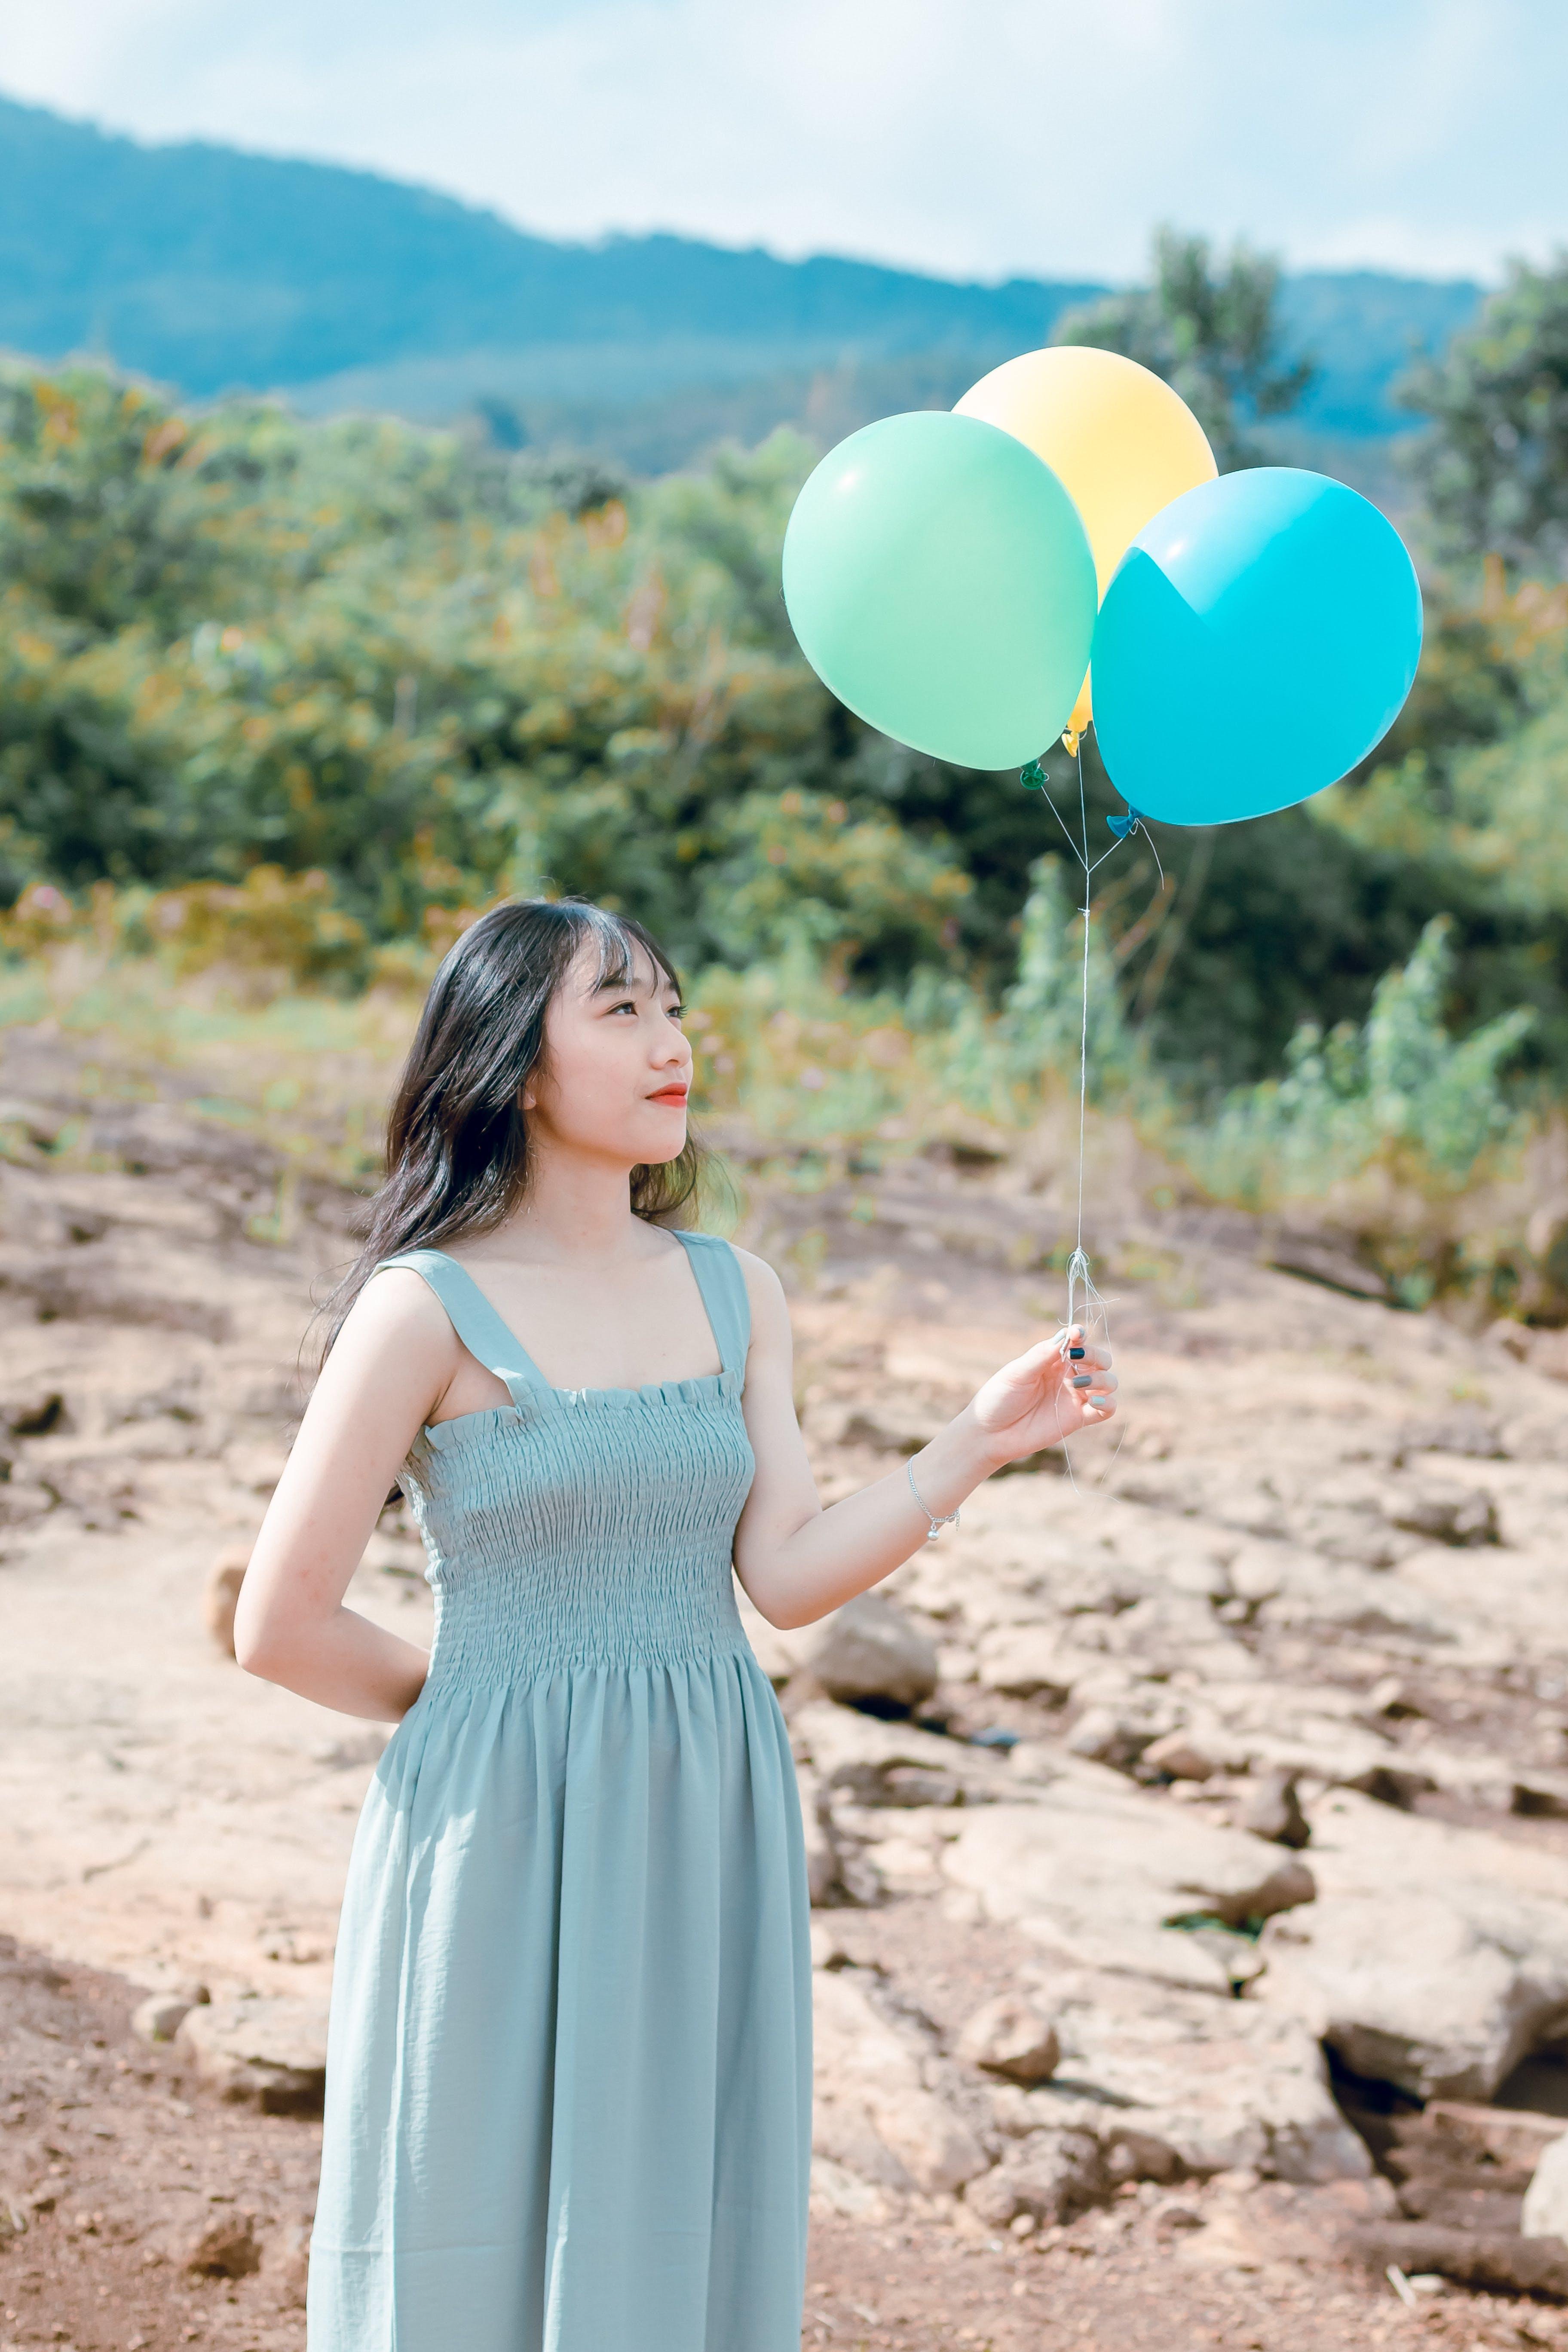 Kostenloses Stock Foto zu asiatin, asiatische frau, ballons, frau